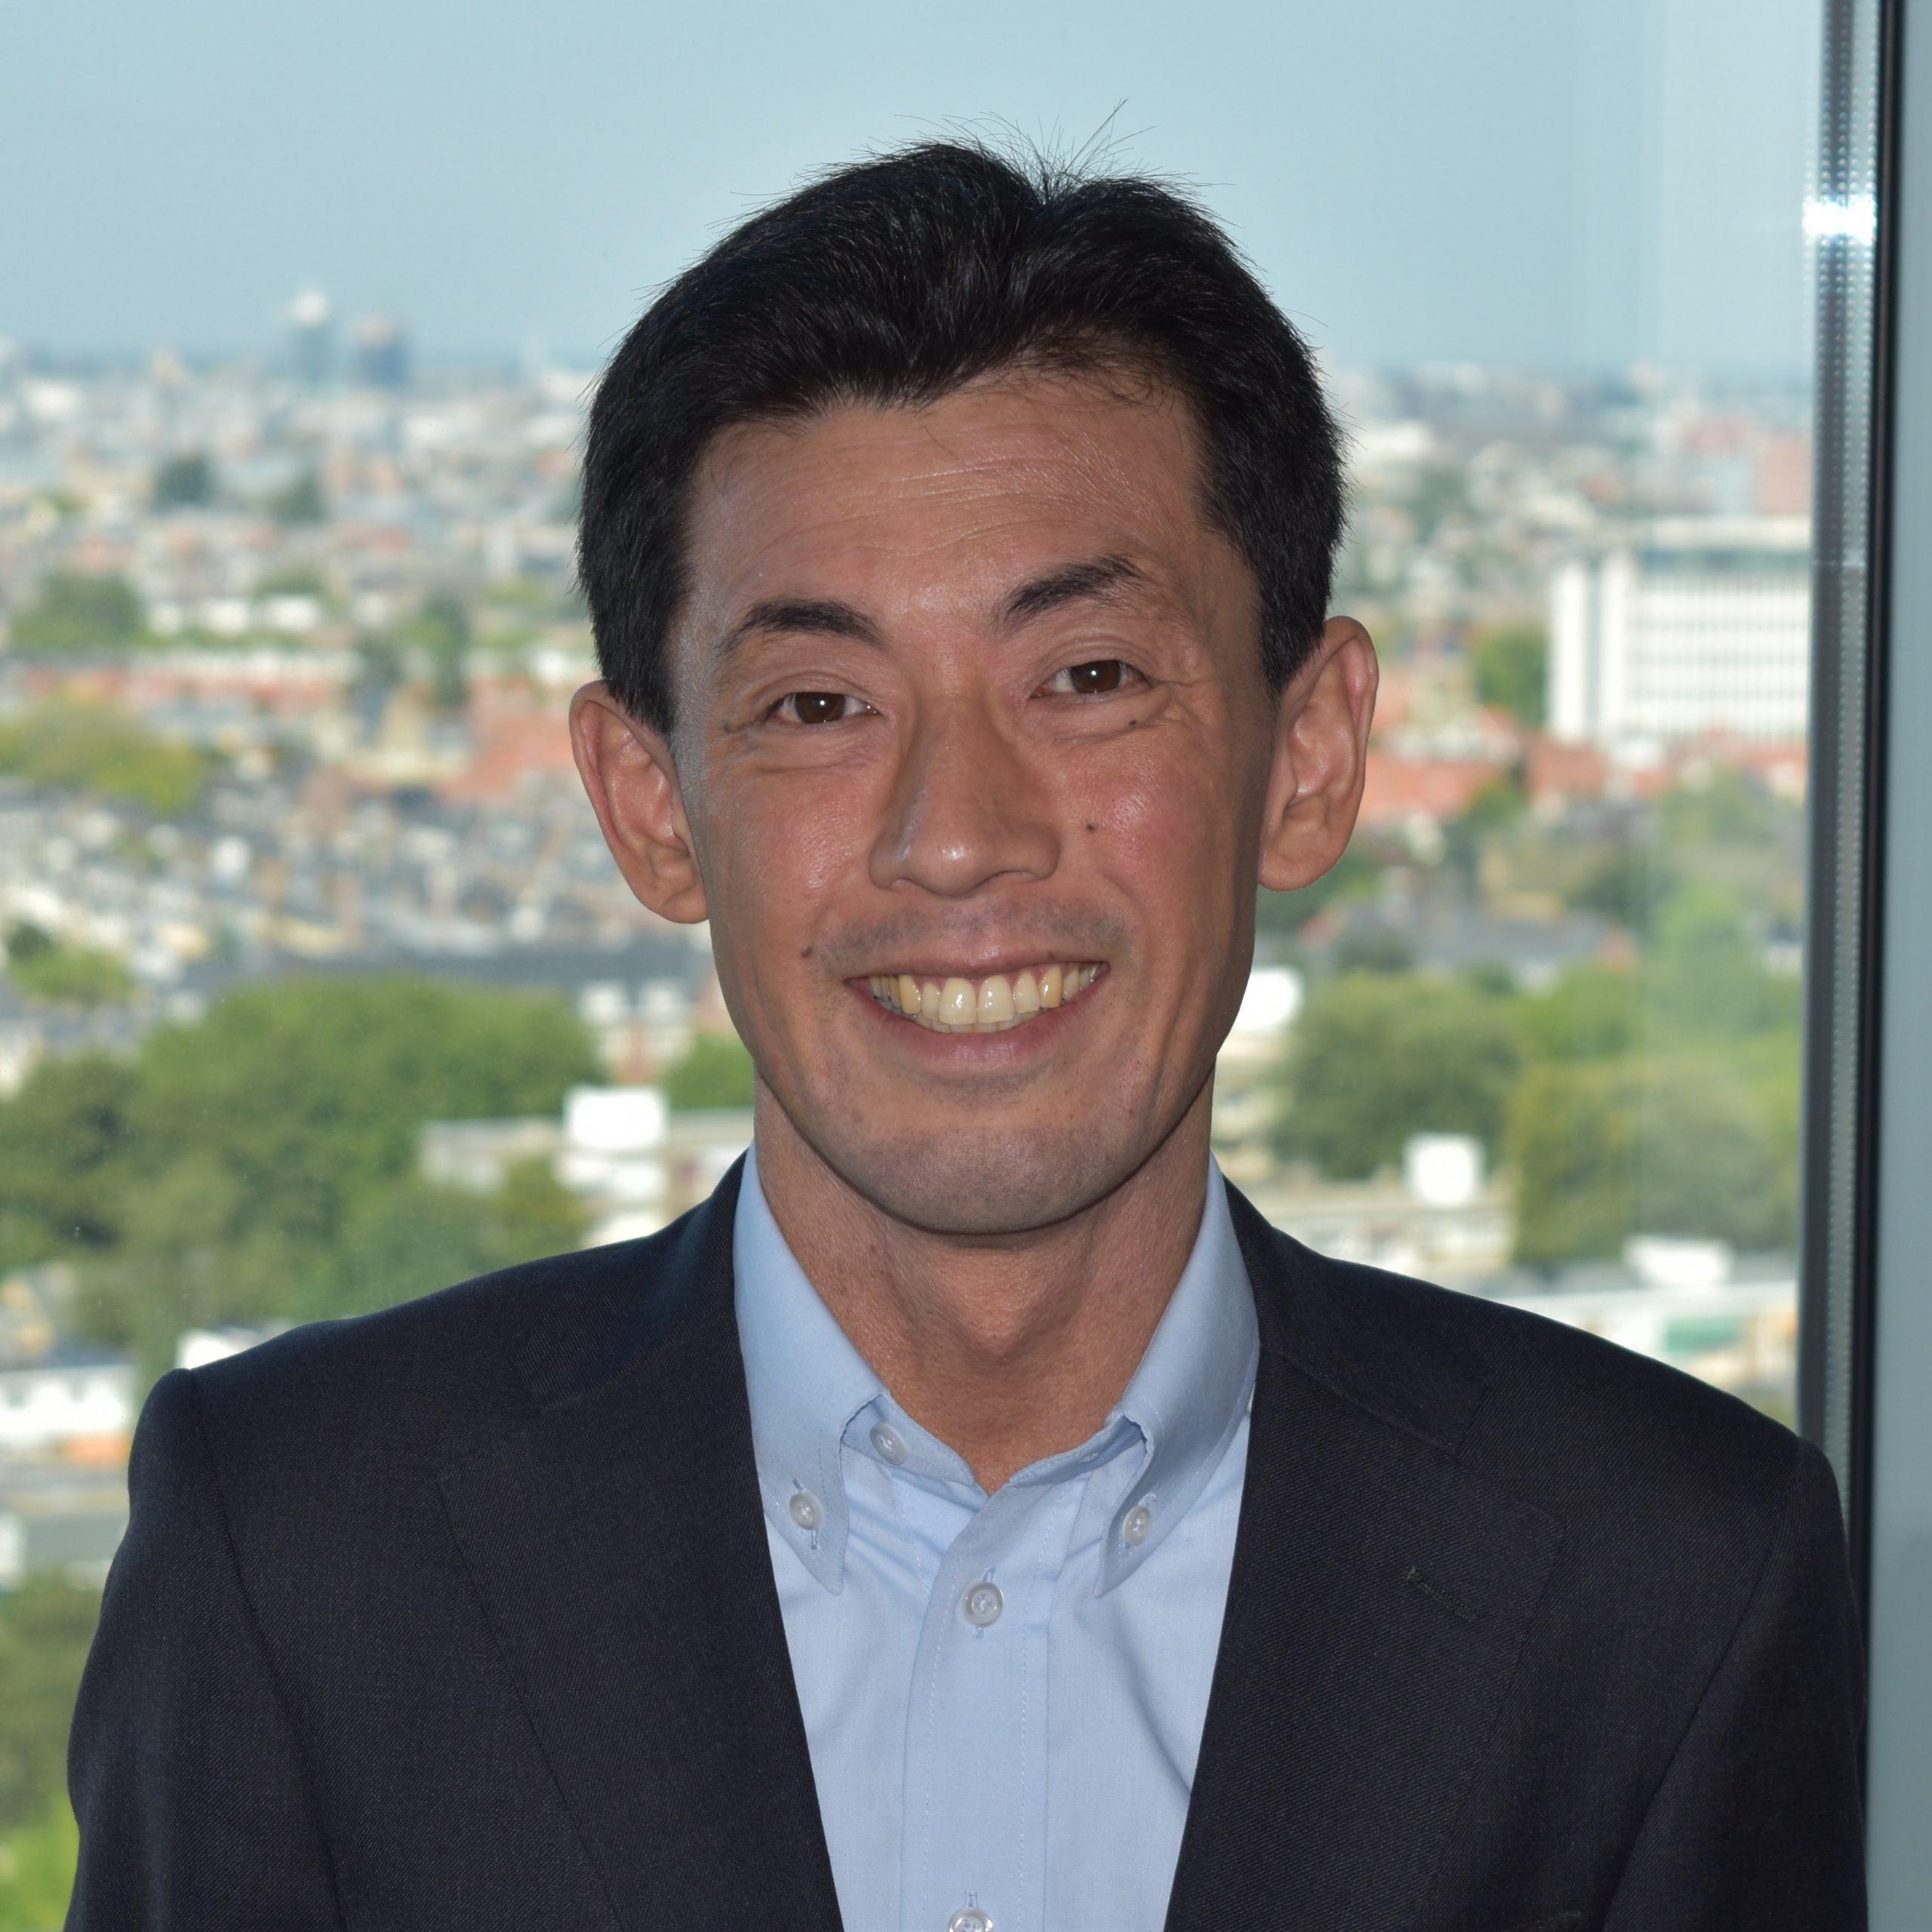 https://tundraadvisory.com/wp-content/uploads/2020/06/Taichi-Katayama_zdj_kwadrat-scaled.jpg